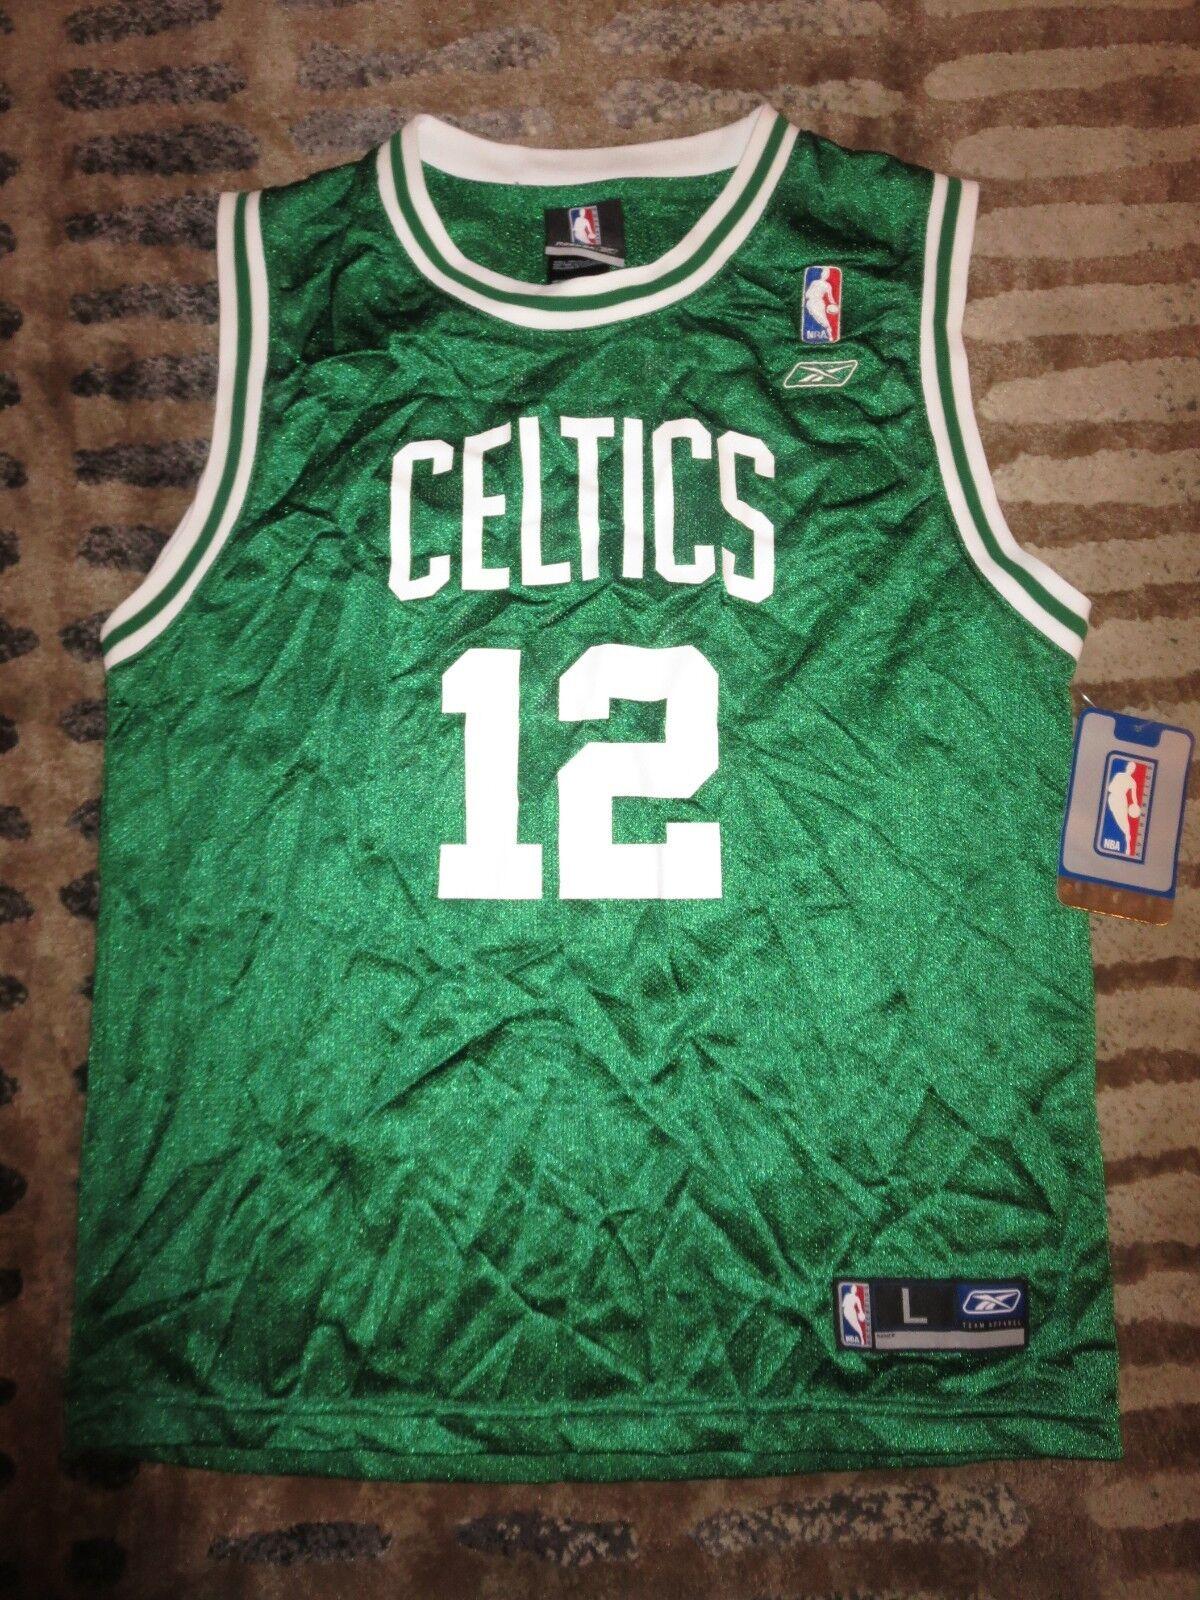 Glen Big Baby Davis  12 Boston Celtics Celtics Celtics NBA Reebok Trikot Jugendliche L 14-16 0b6150